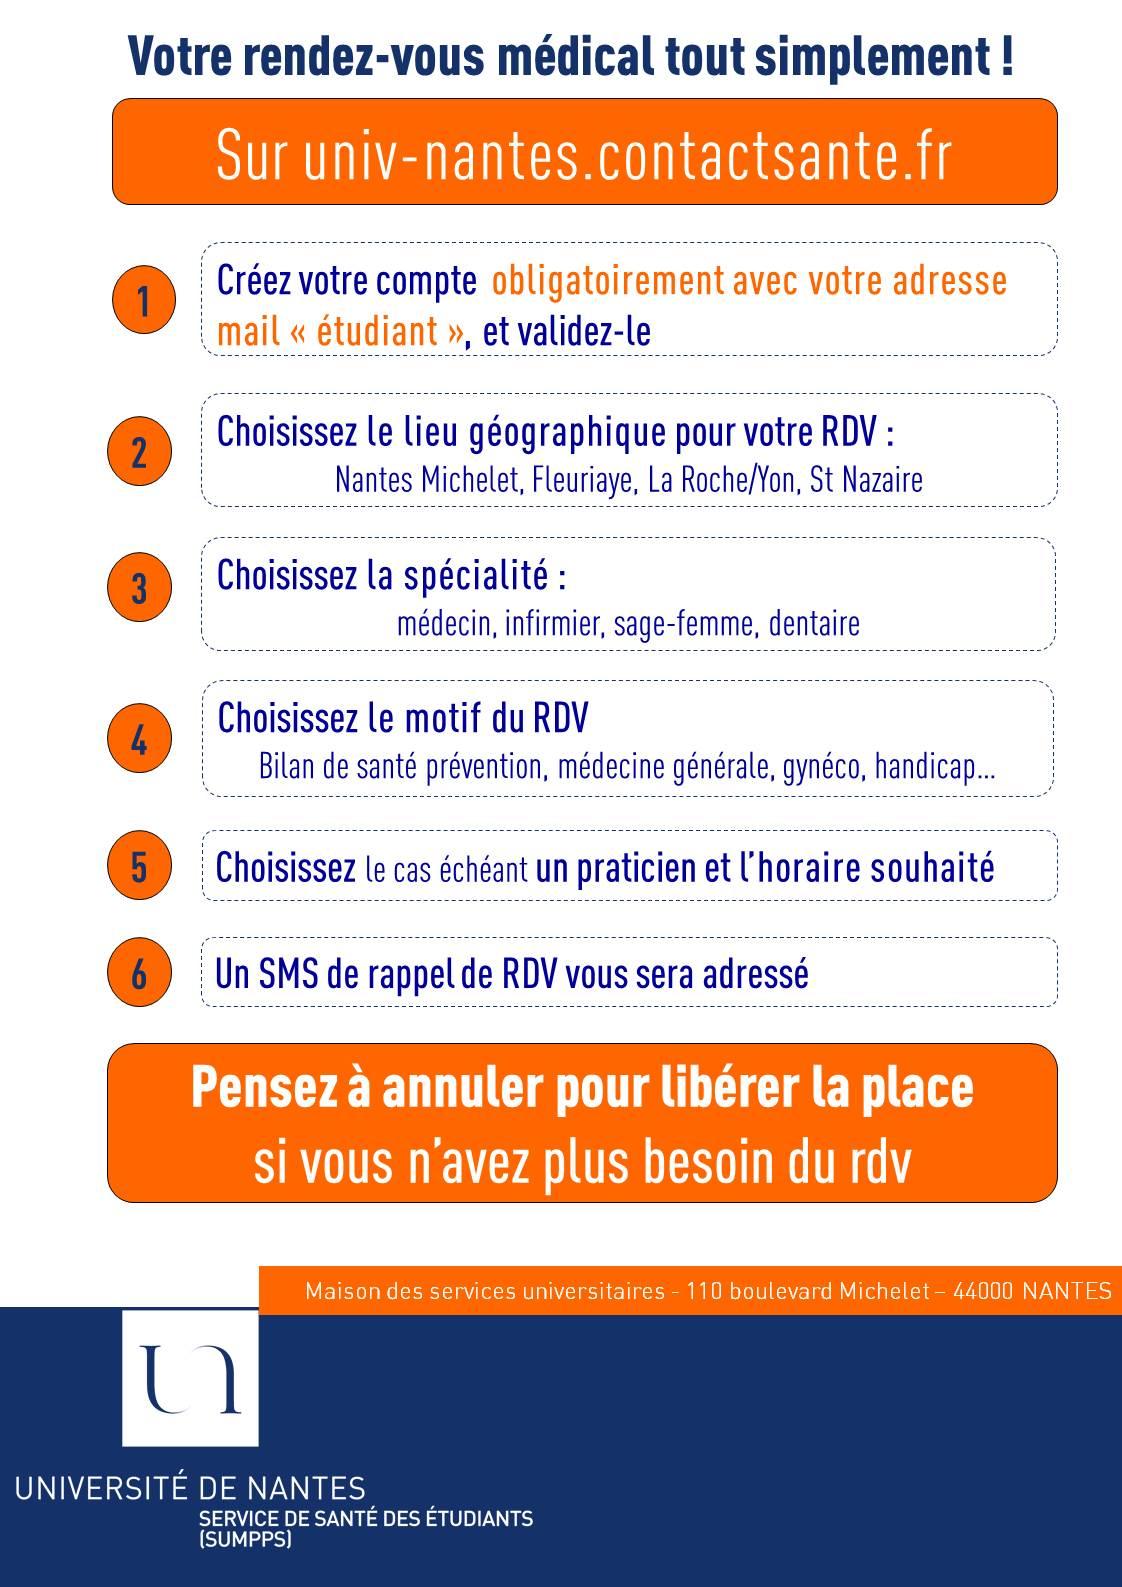 https://univ-nantes.contactsante.fr